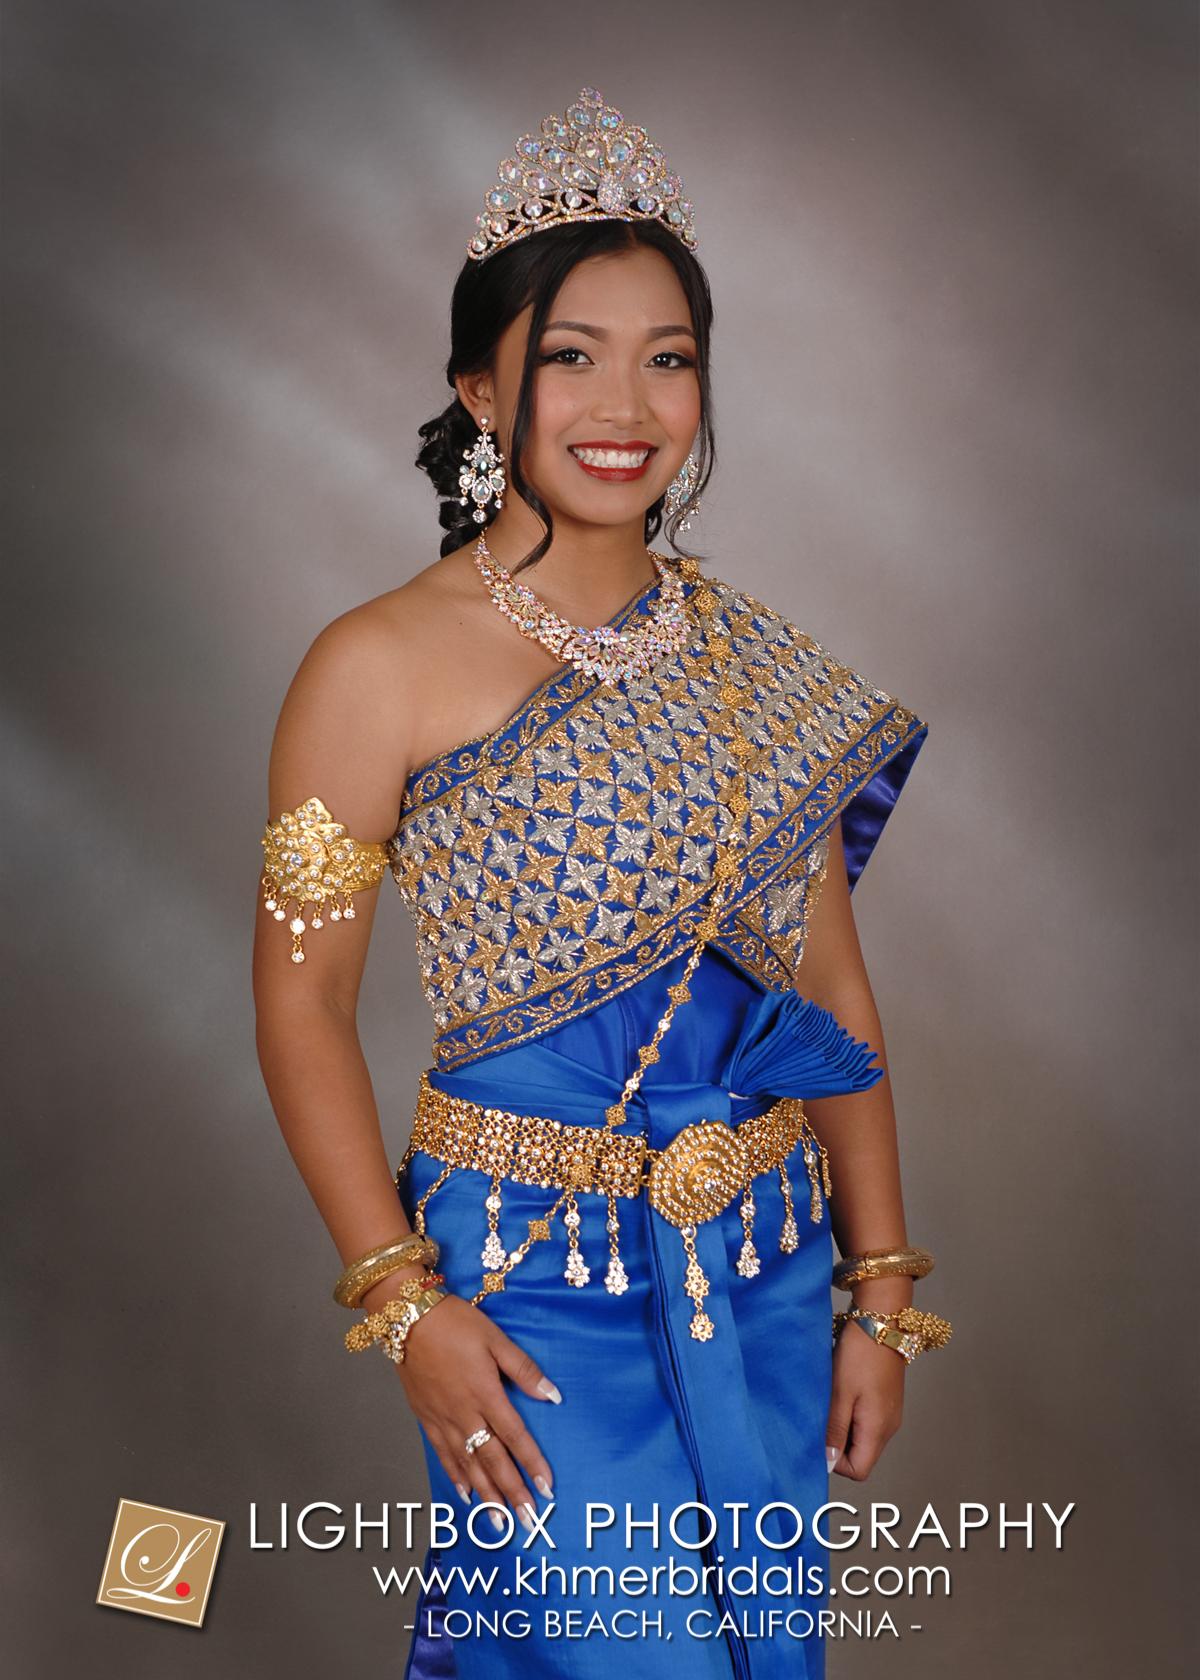 Apsara Khmer Bridal Wedding Photography and video-202.jpg